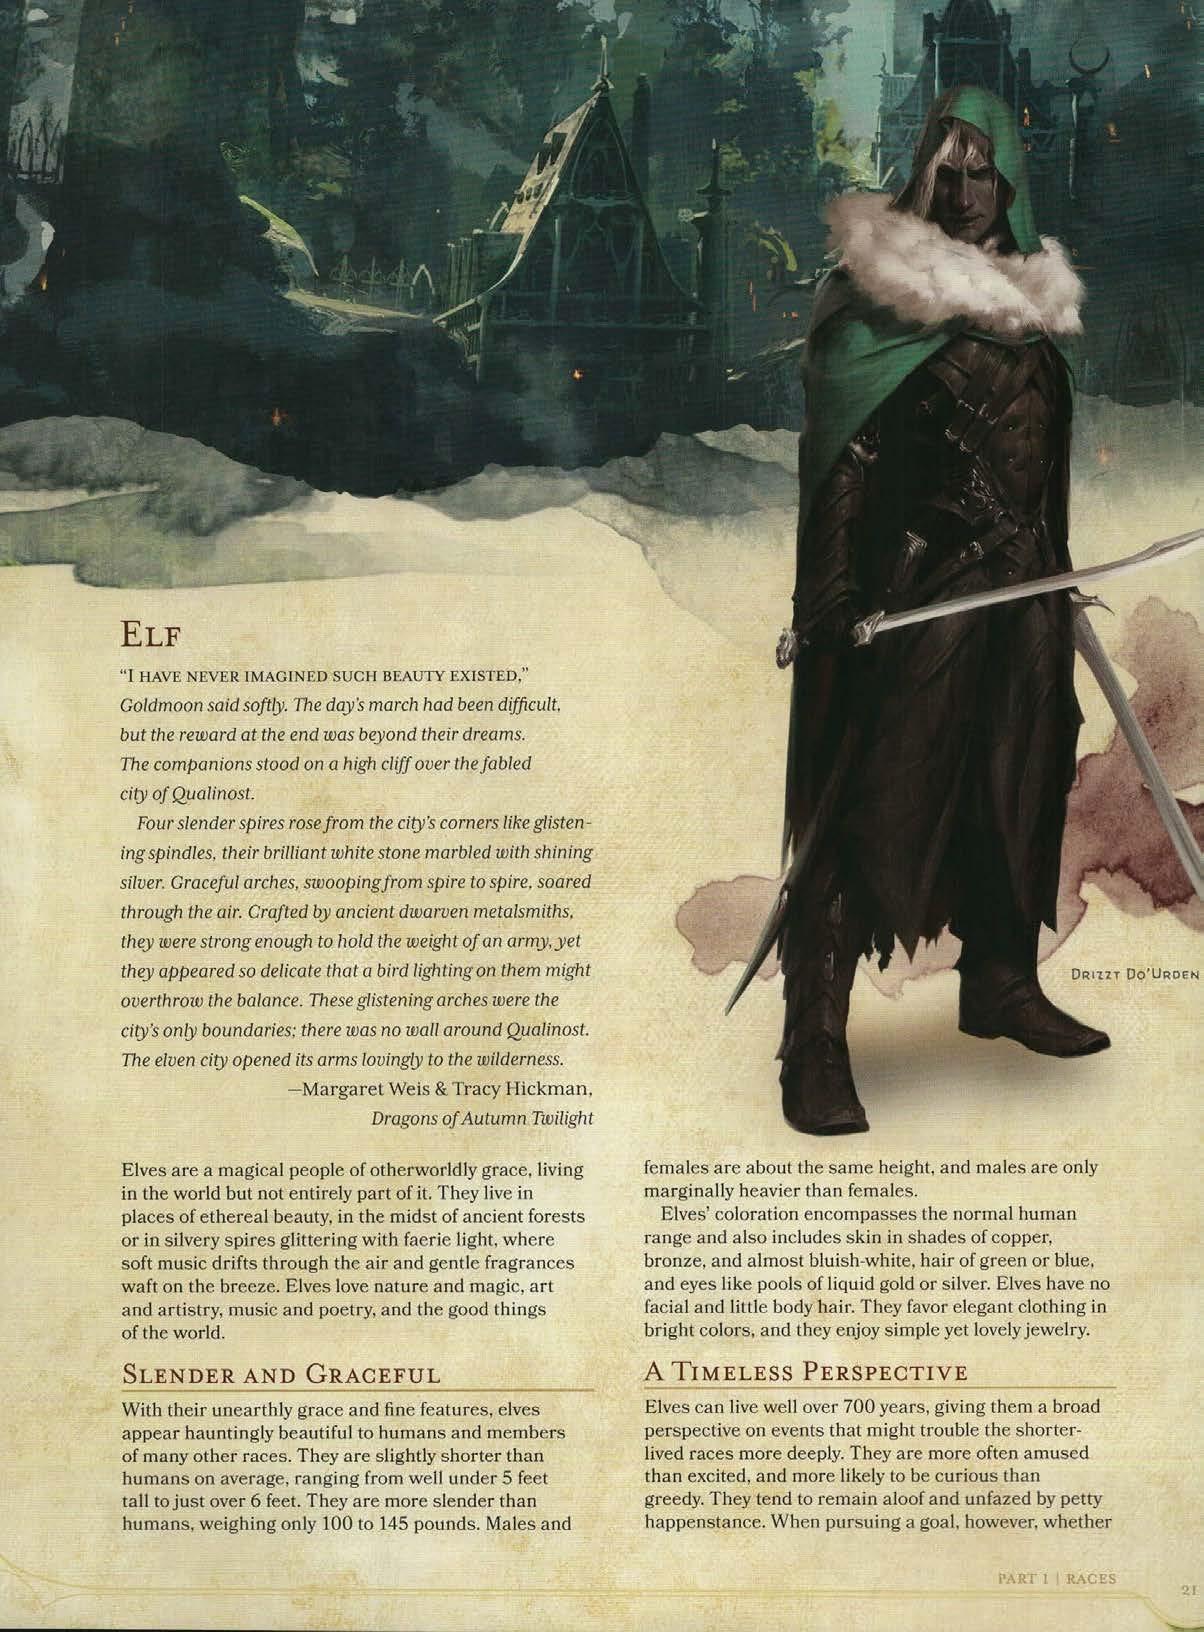 Elf description 1